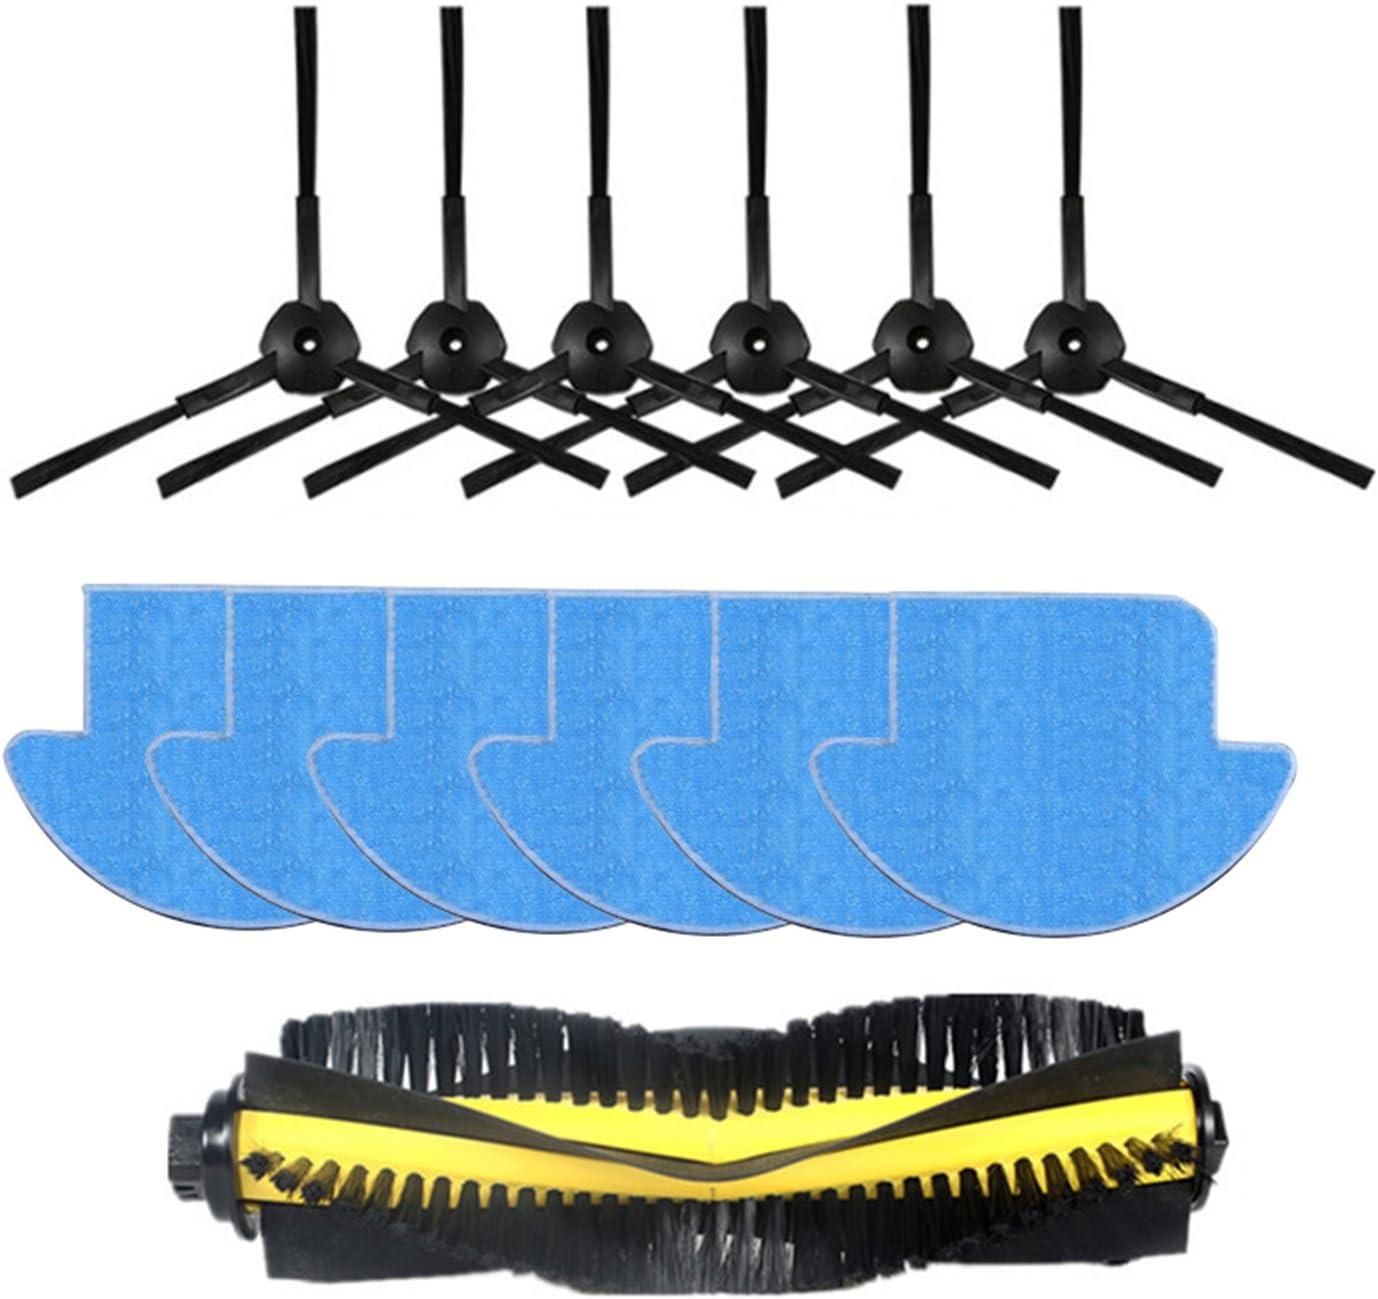 reyee 13 unidades iLife V7S iLife V7S Pro Robot aspiradora partes ...